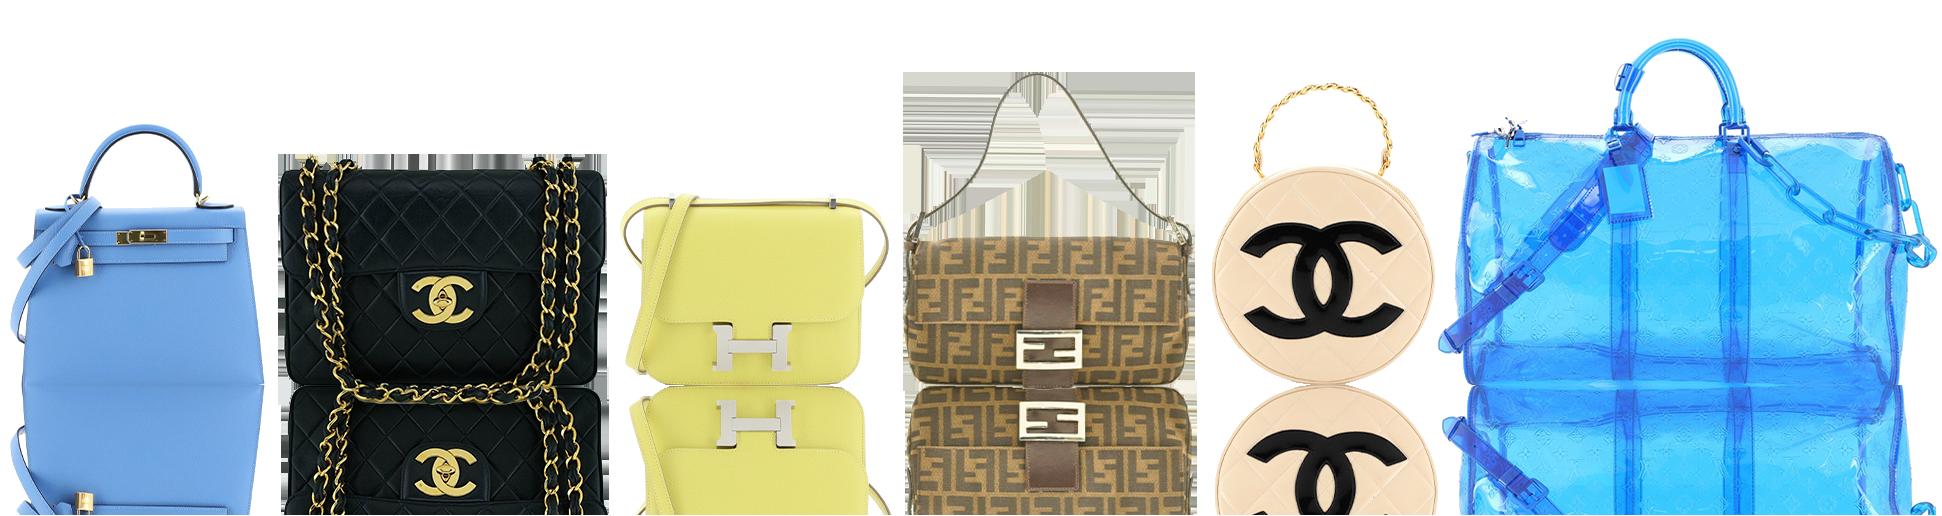 Handbags On Shelf At Brick and Mortar Boutique